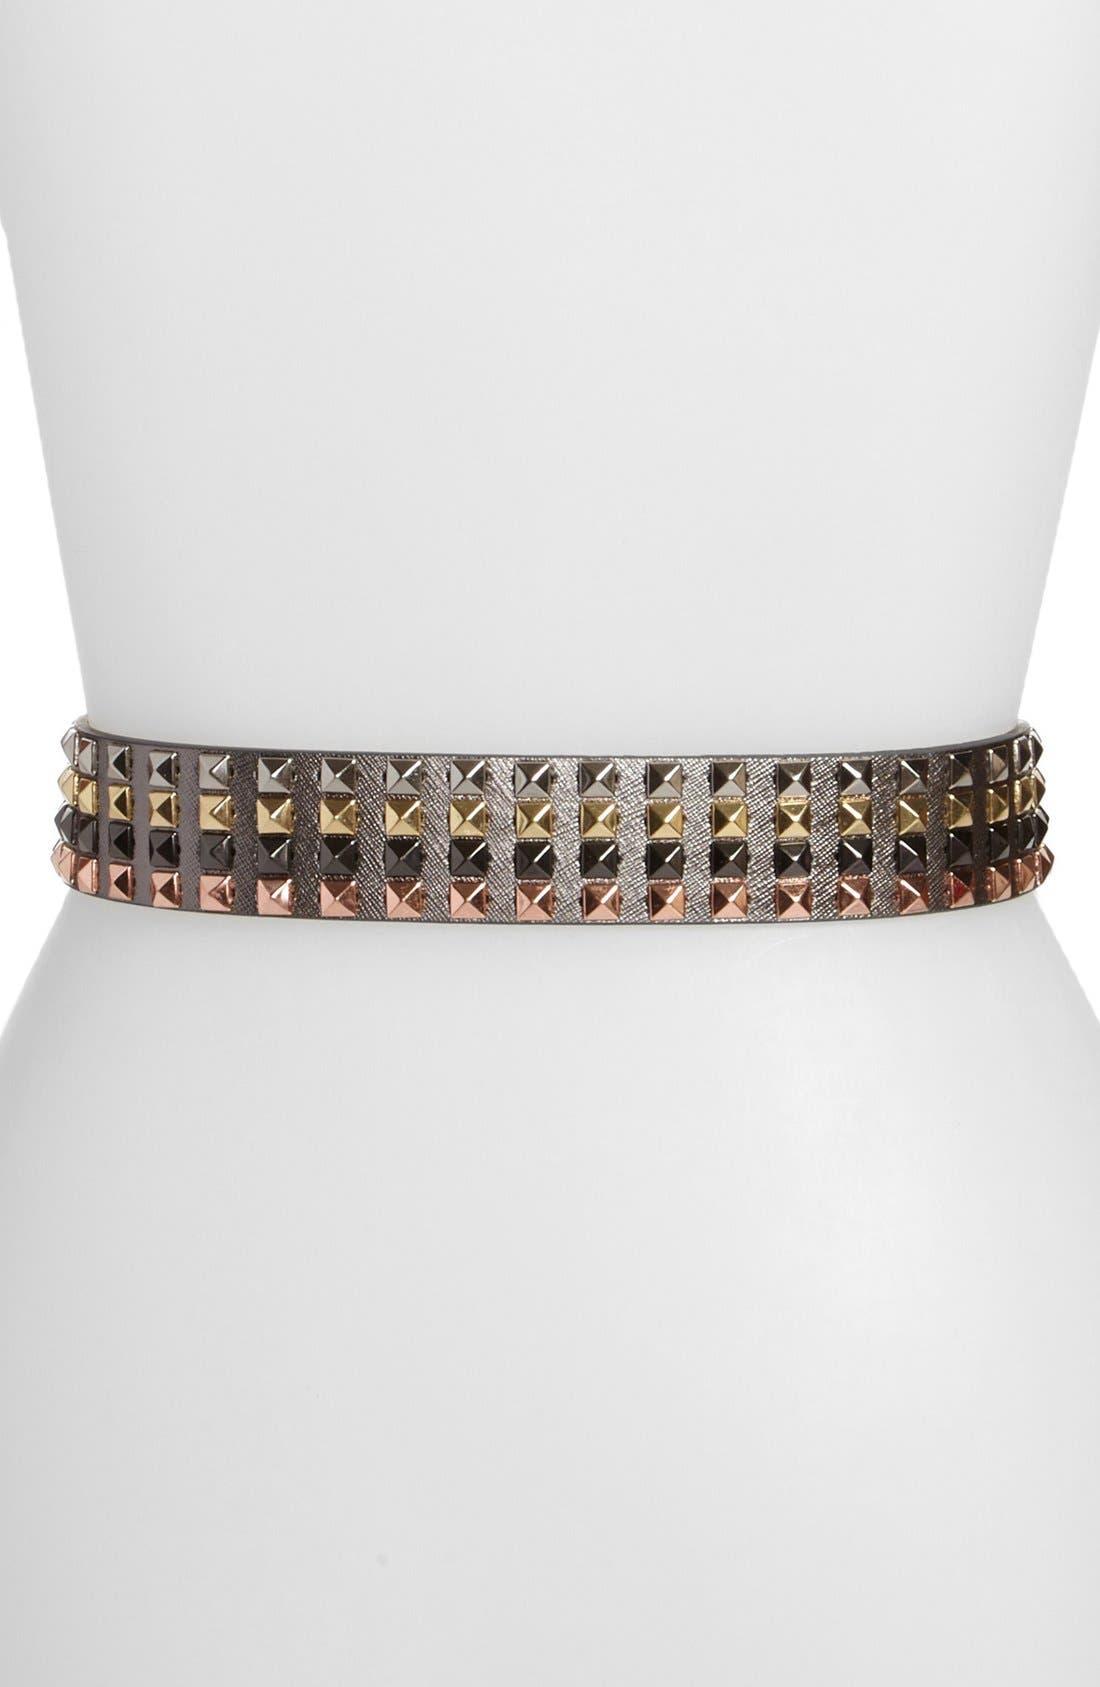 Alternate Image 2  - MICHAEL Michael Kors Pyramid Studded Metallic Saffiano Leather Belt